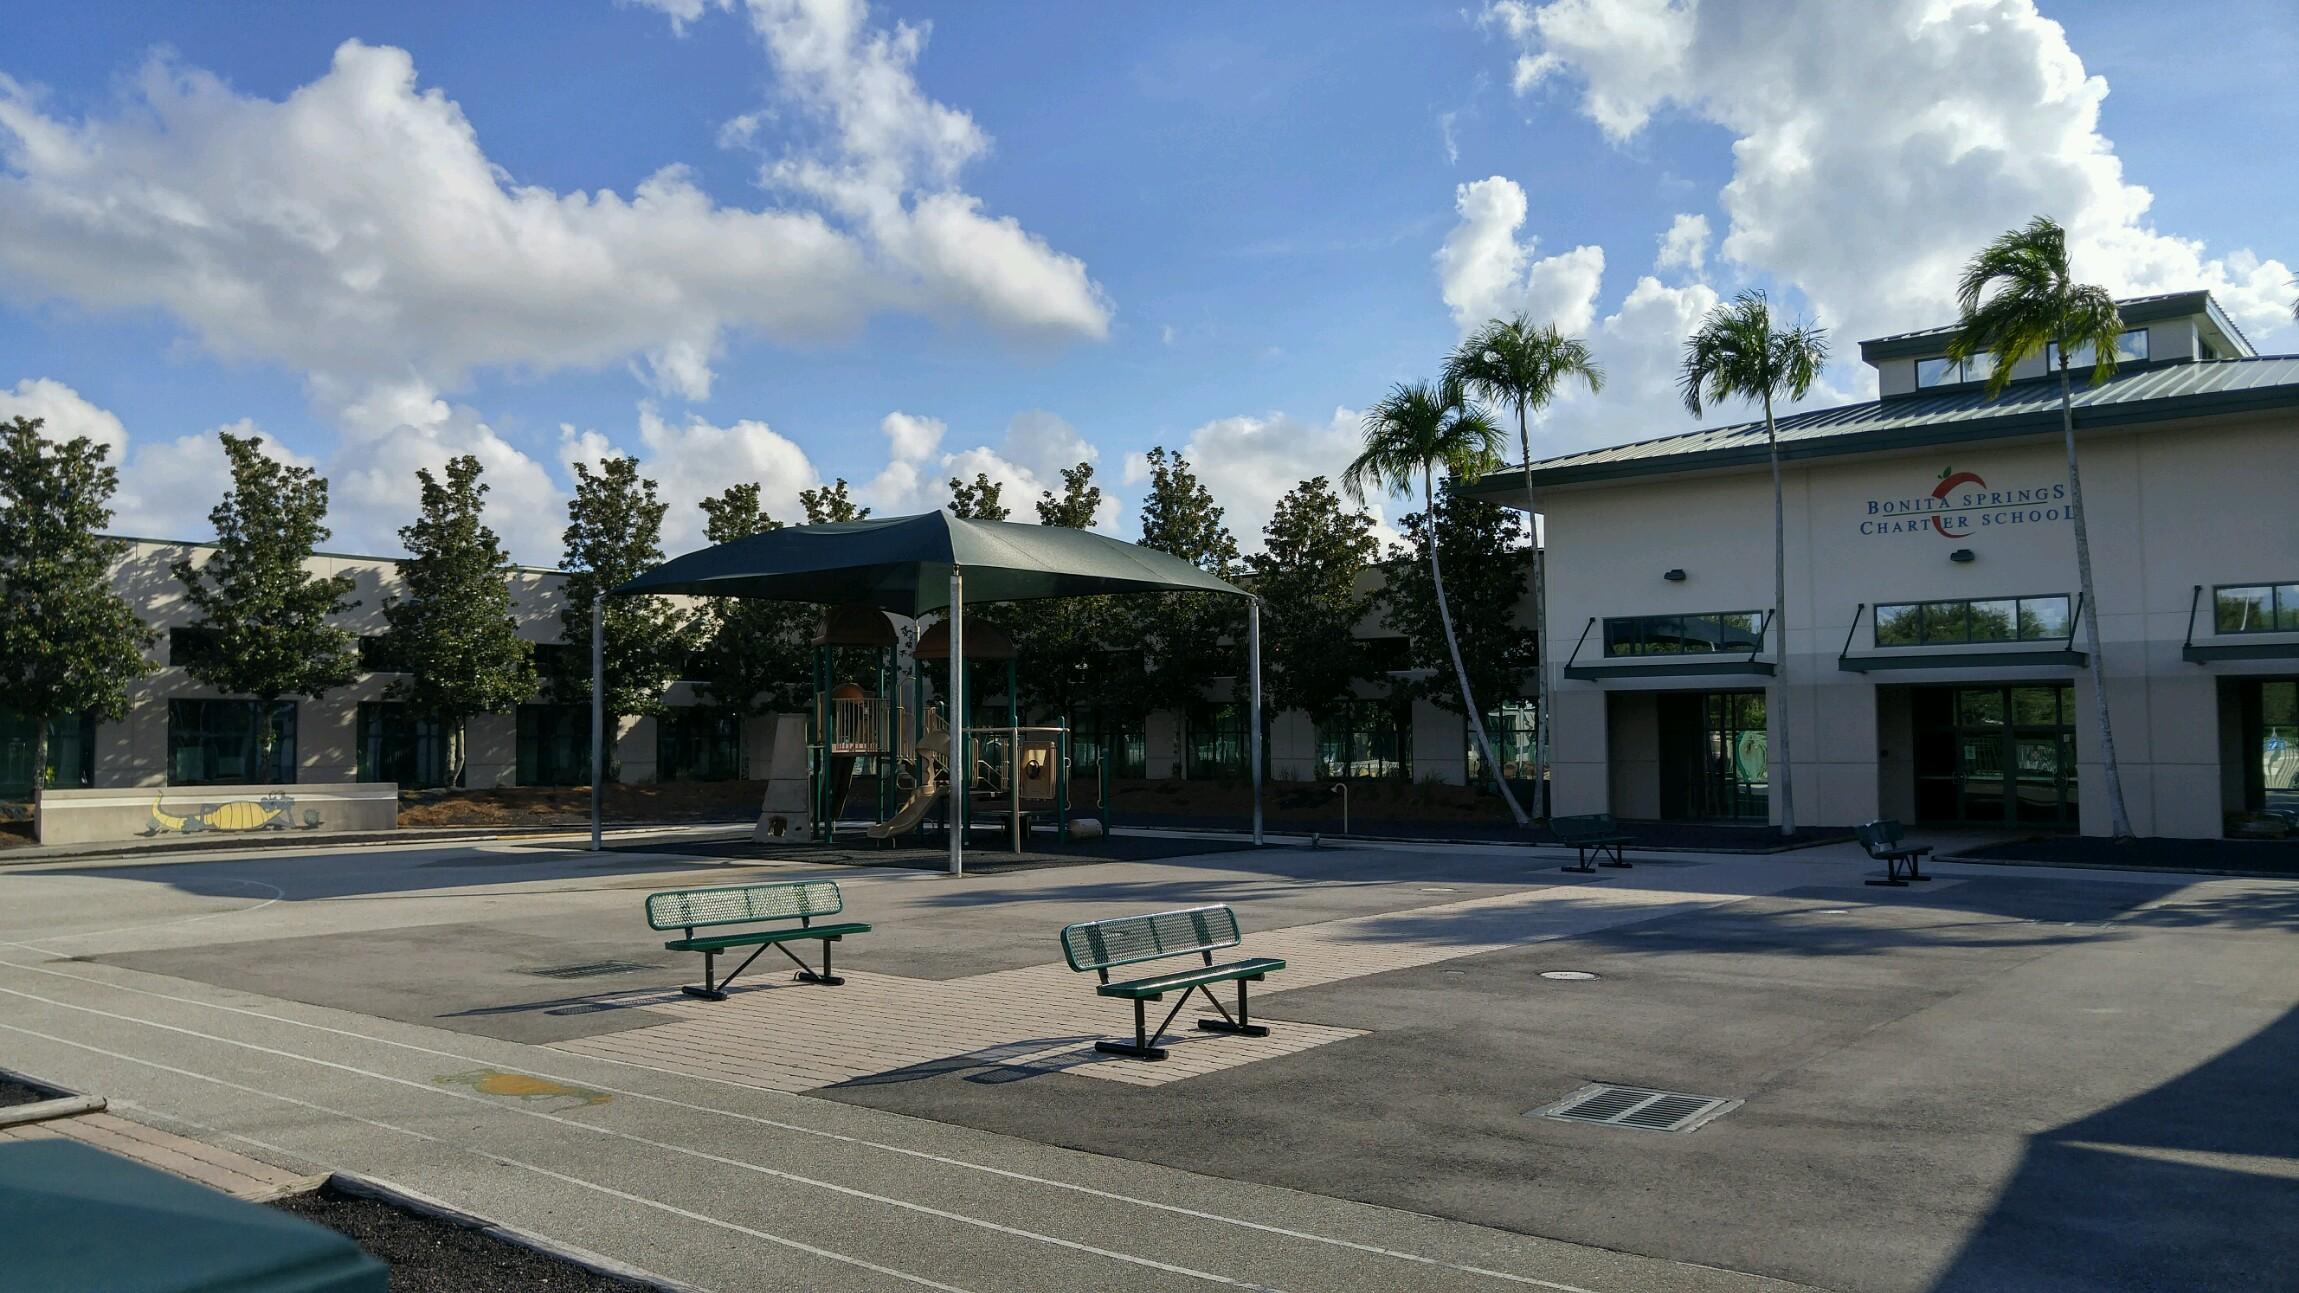 shadeports naples Coastal Canvas & Awnings - Fort Myers, Naples, SWFL